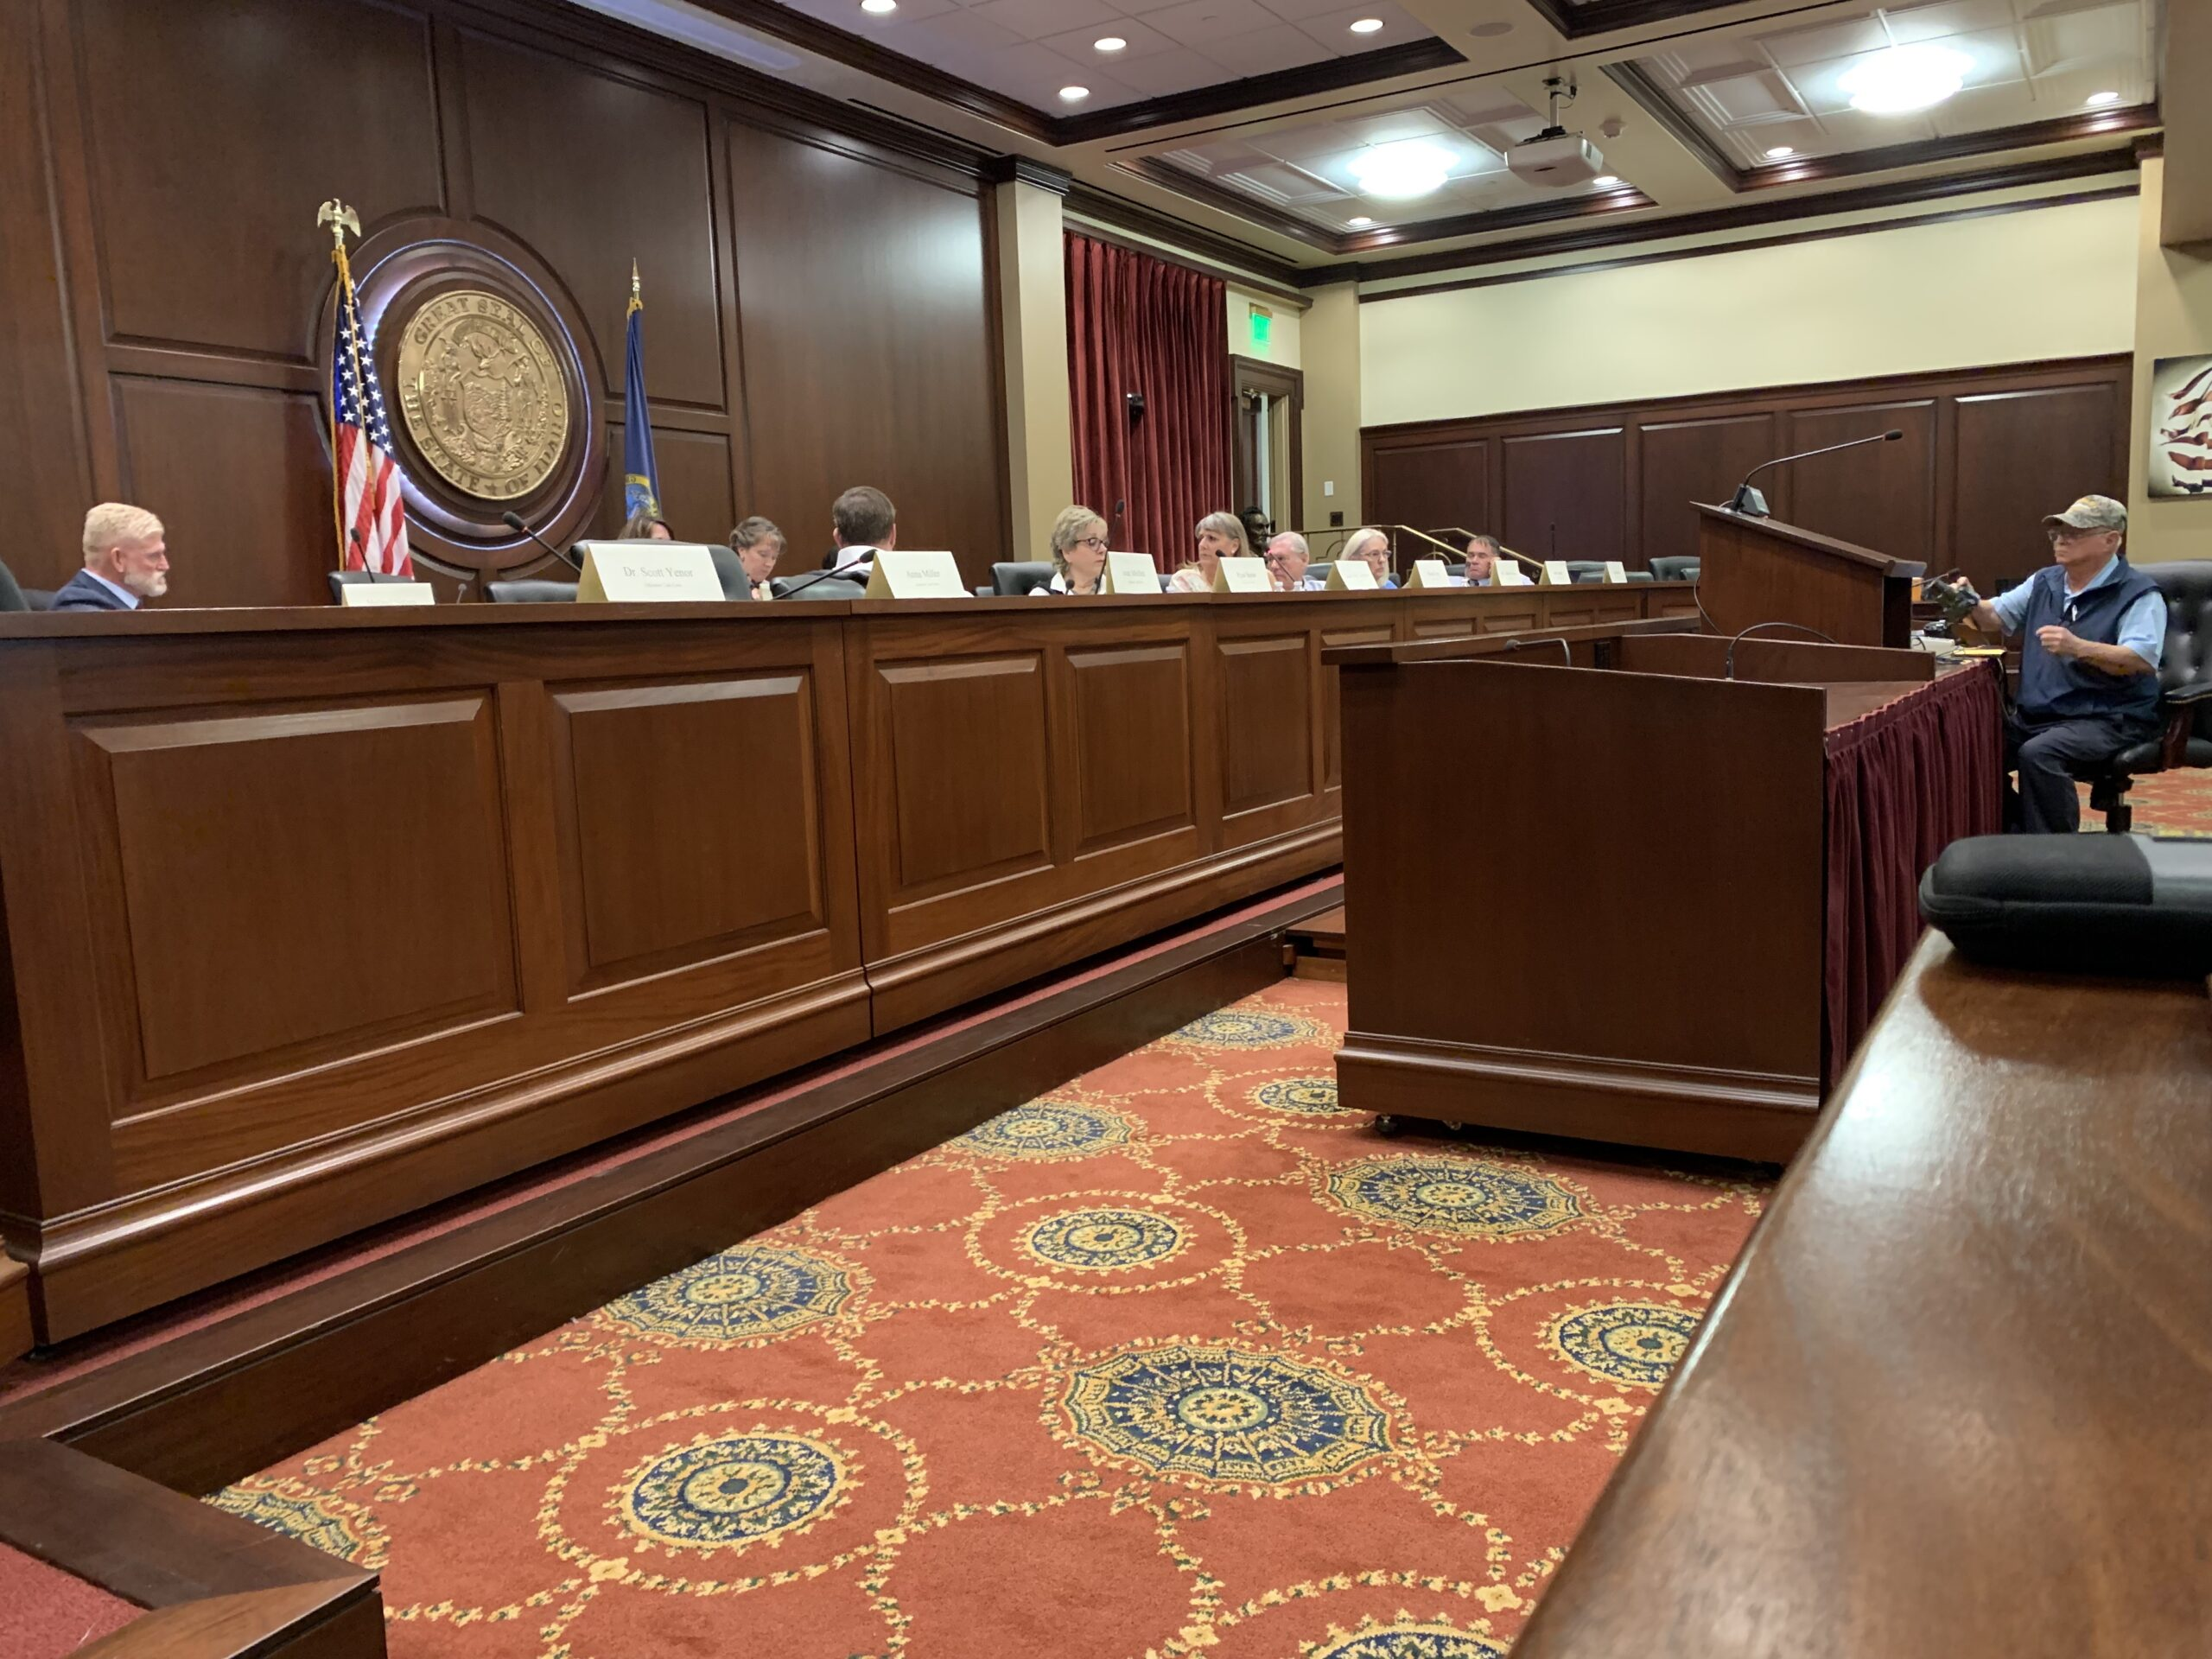 Idaho Lt. Gov. McGeachin's task force pushes school choice recommendation